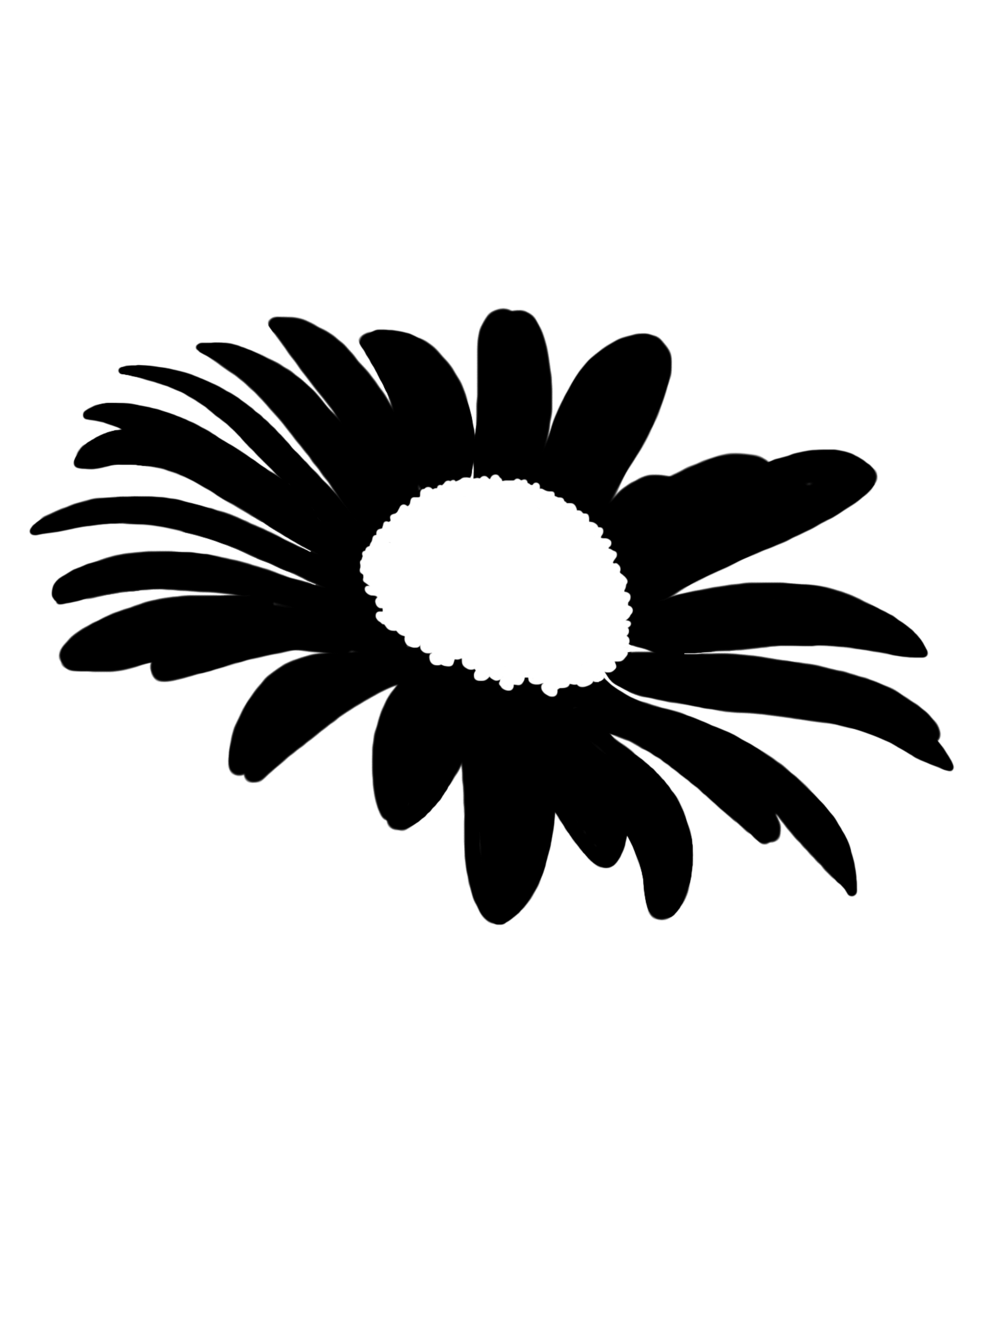 icon black transparent.png